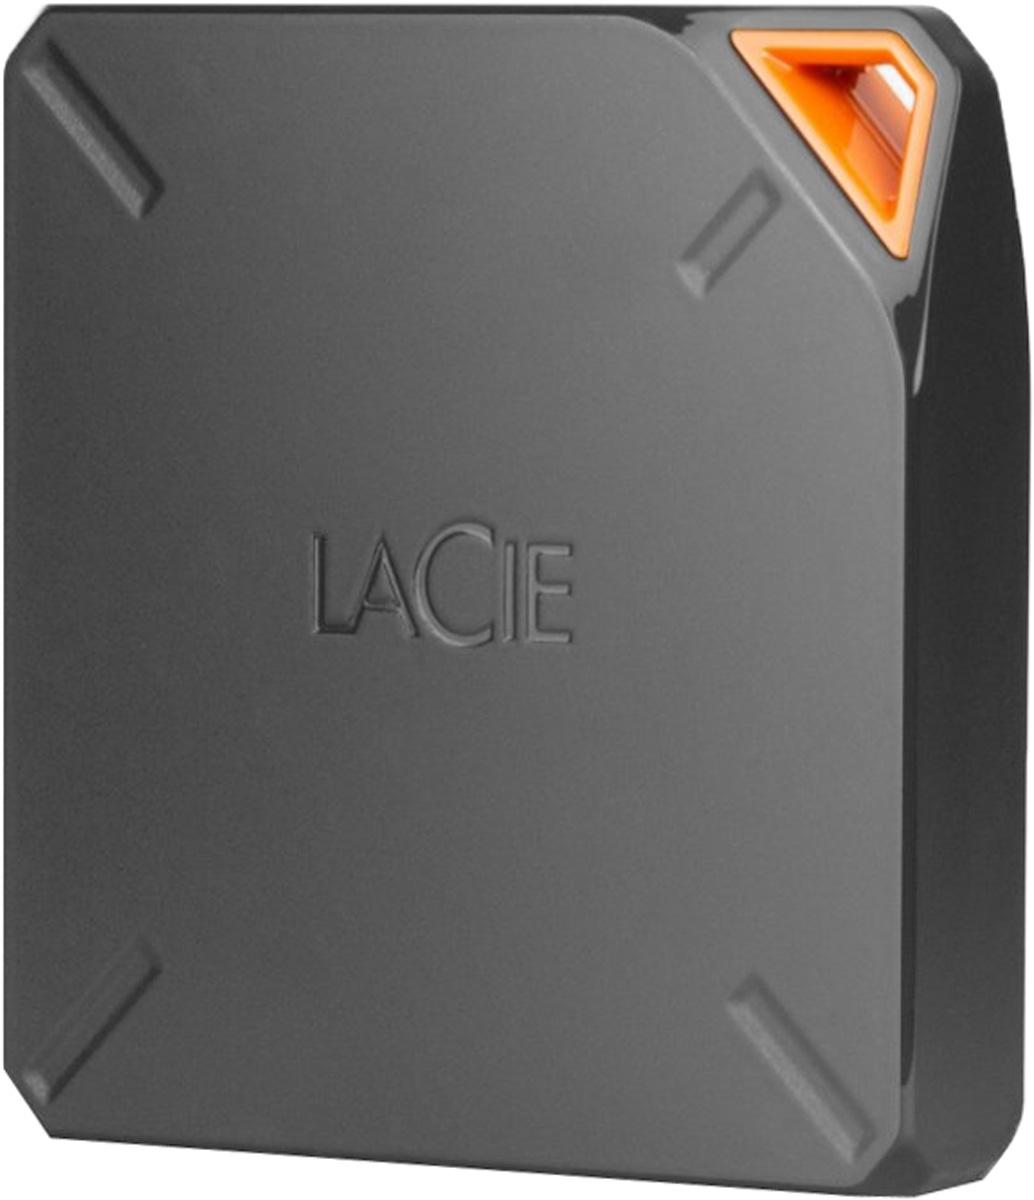 LaCie Fuel 1TB внешний жесткий диск (STFL1000200)